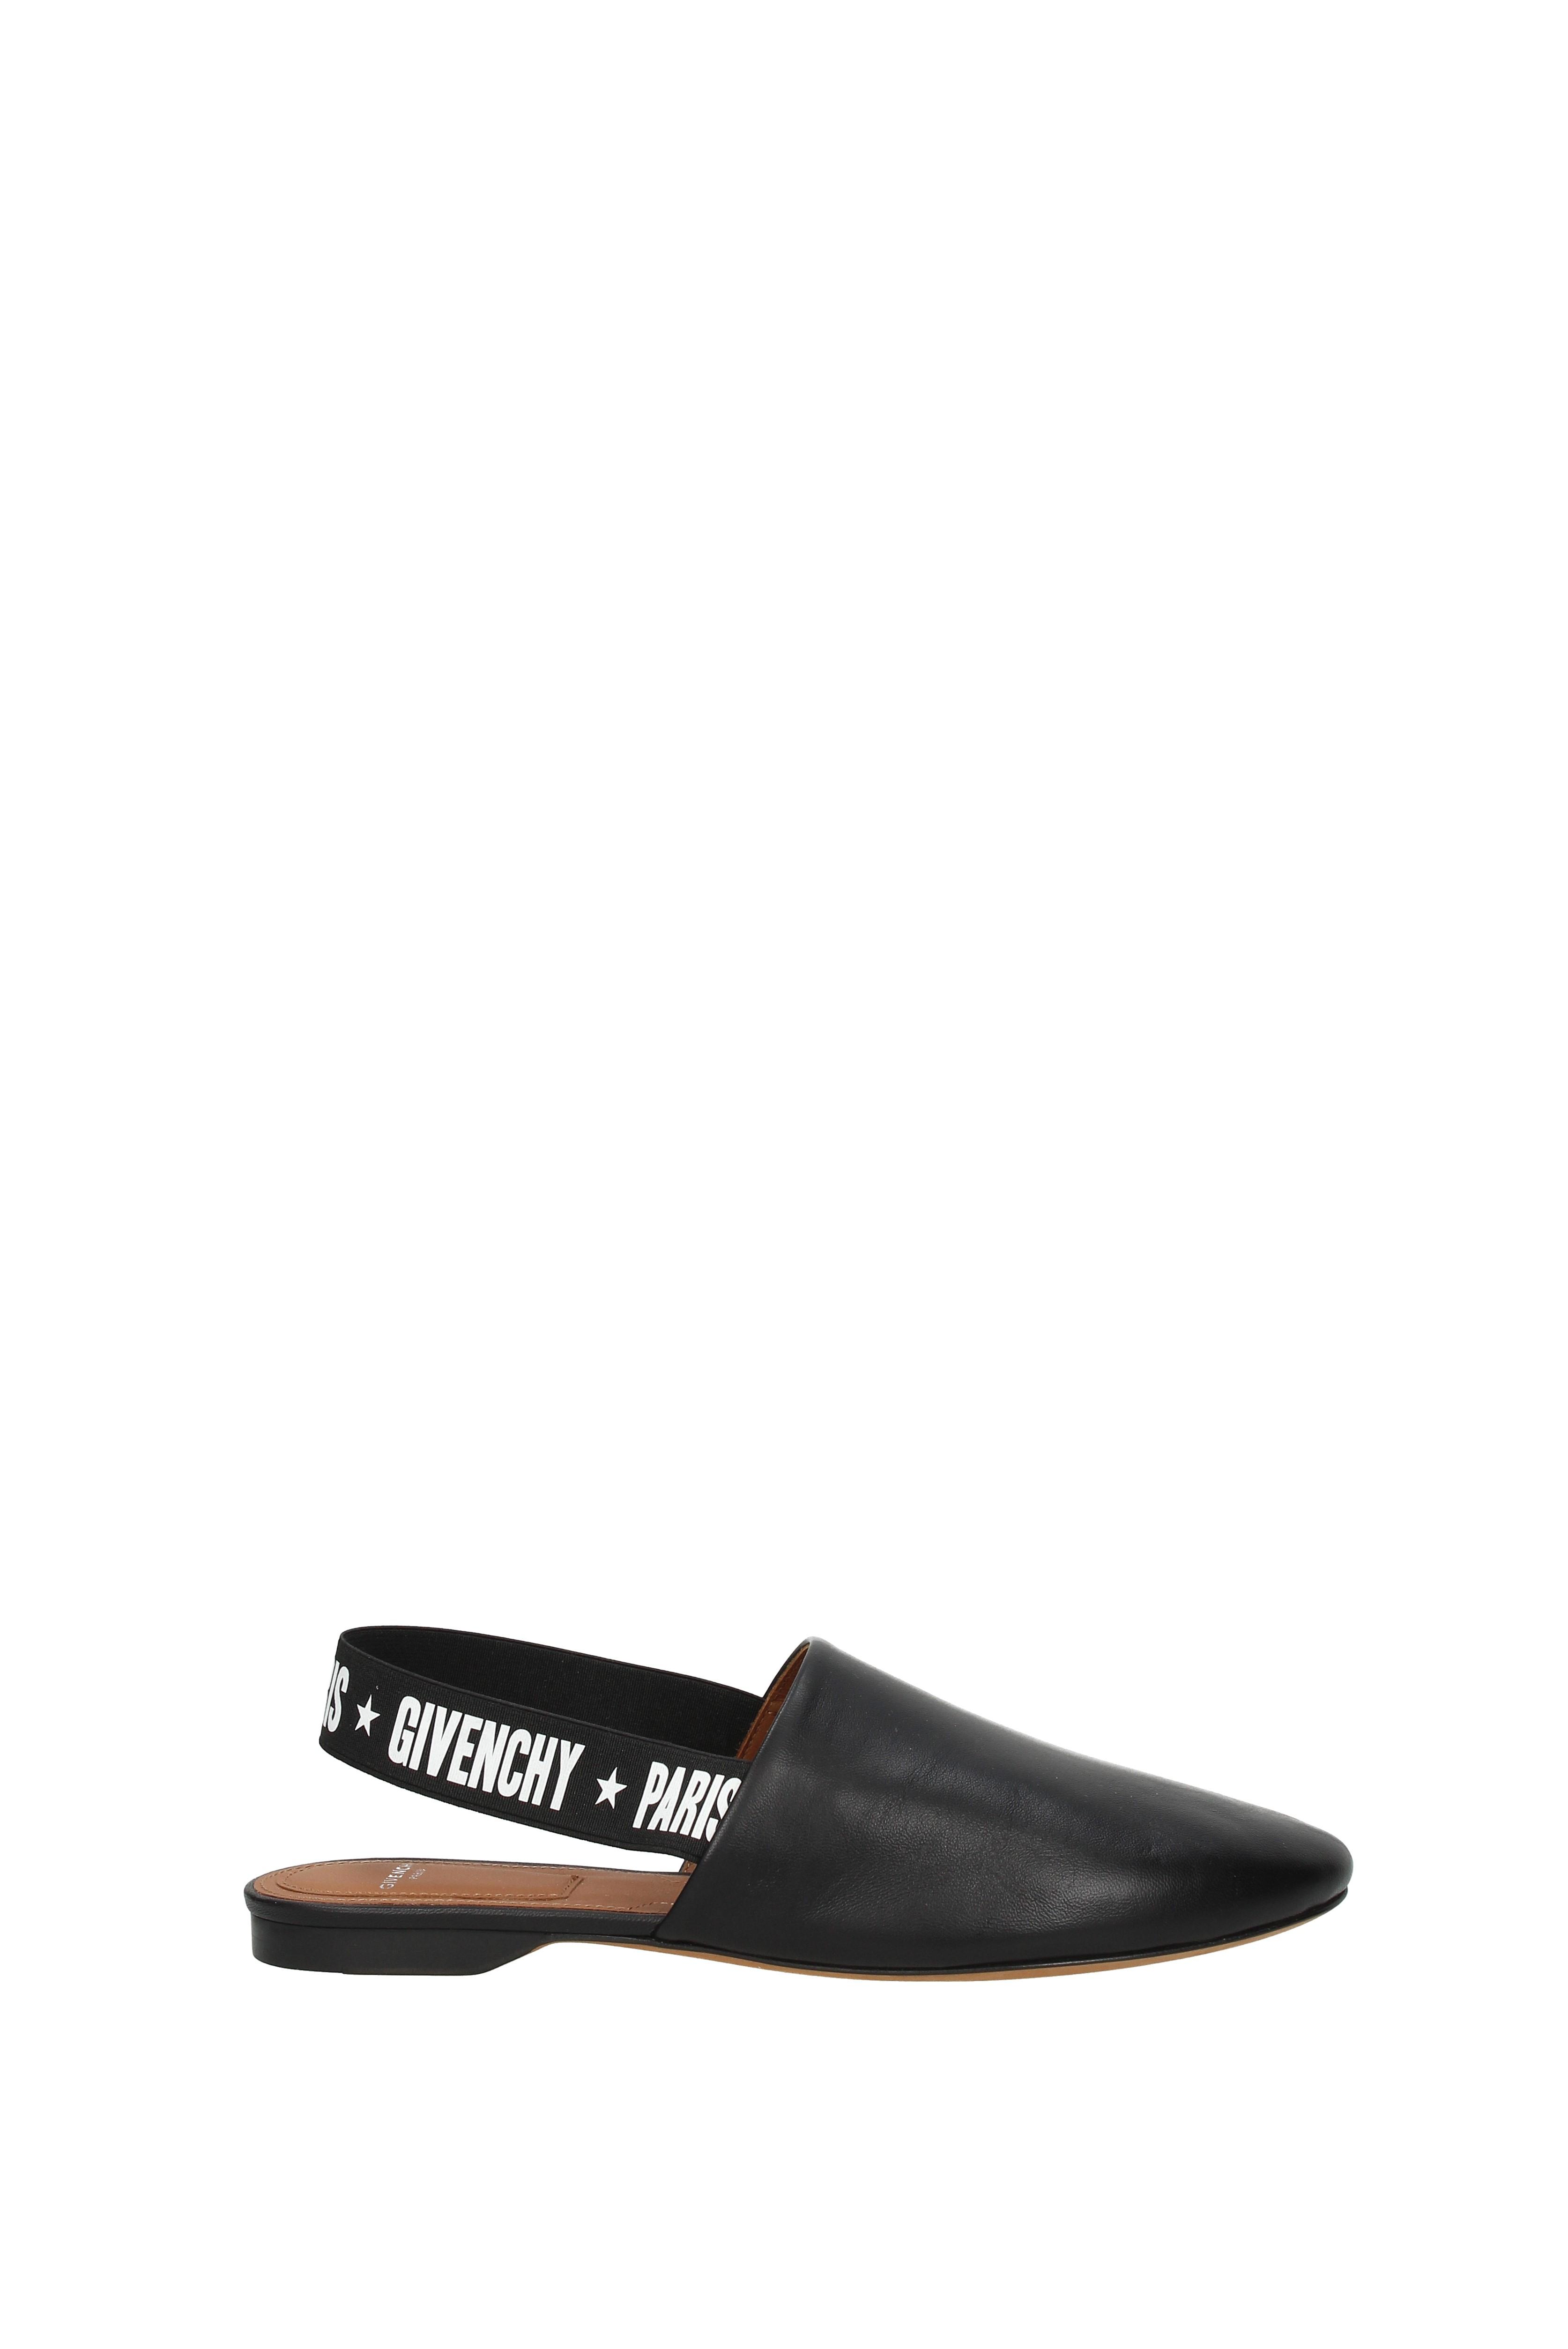 Flip-Flops Flip-Flops Flip-Flops und Holzschuhe Givenchy rivington Damen - Leder (BE2003E00H) 6814b1